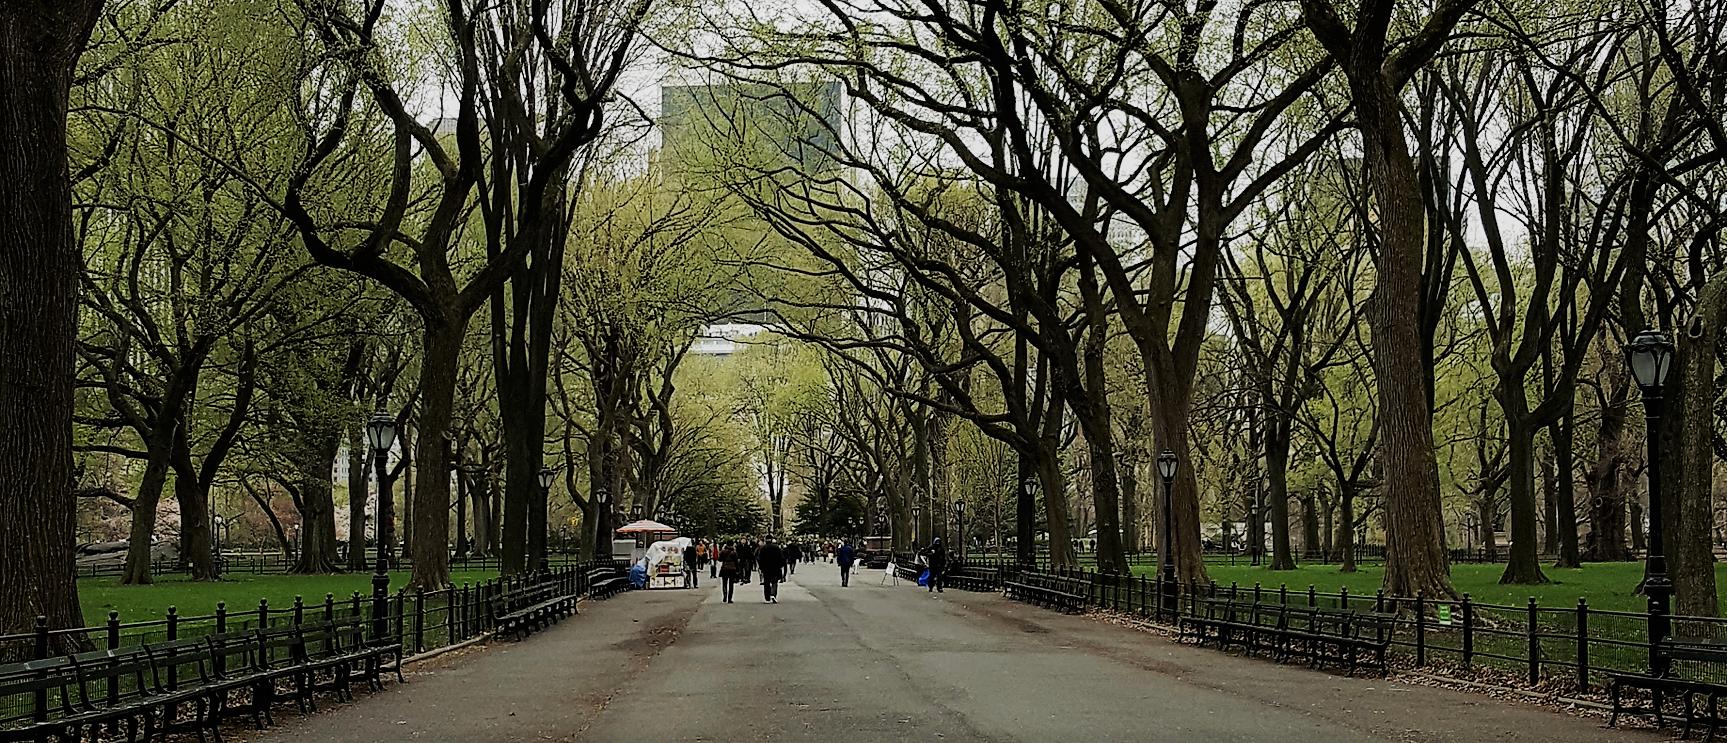 Central Park Promenade in early spring